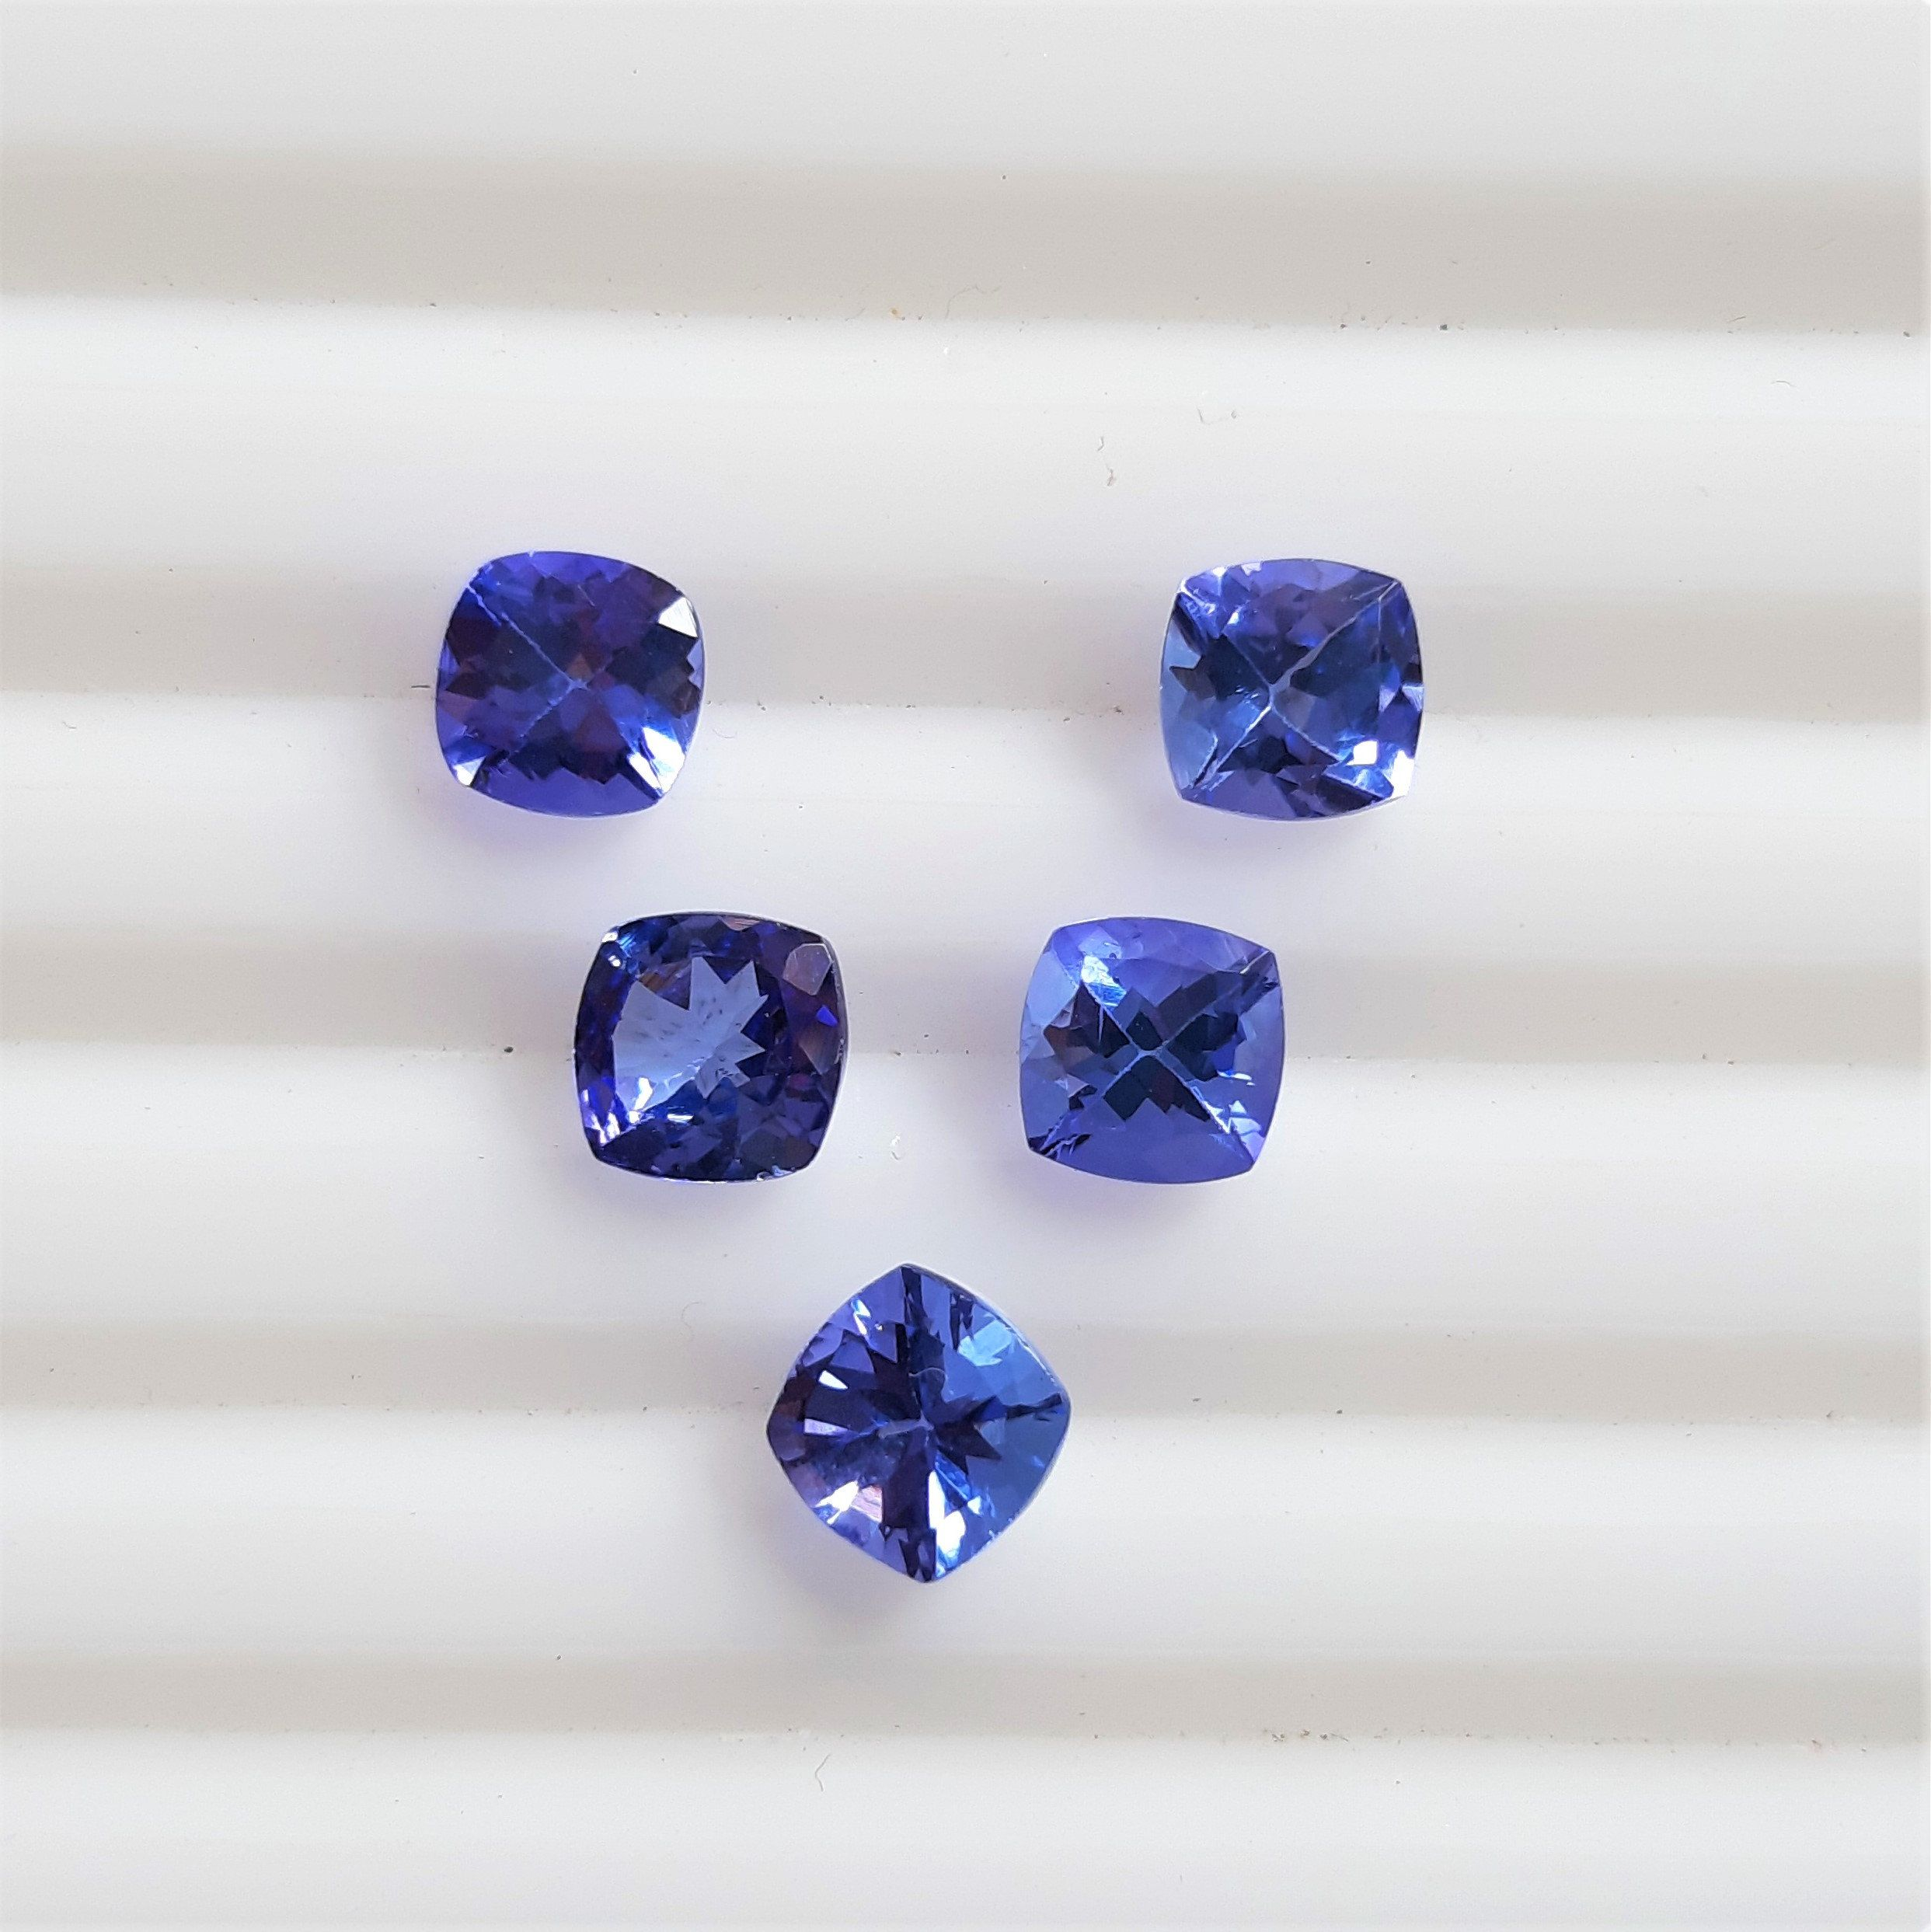 MAN MADE TANZANITE 6 MM SQUARE CUT BEAUTIFUL BLUE COLOR